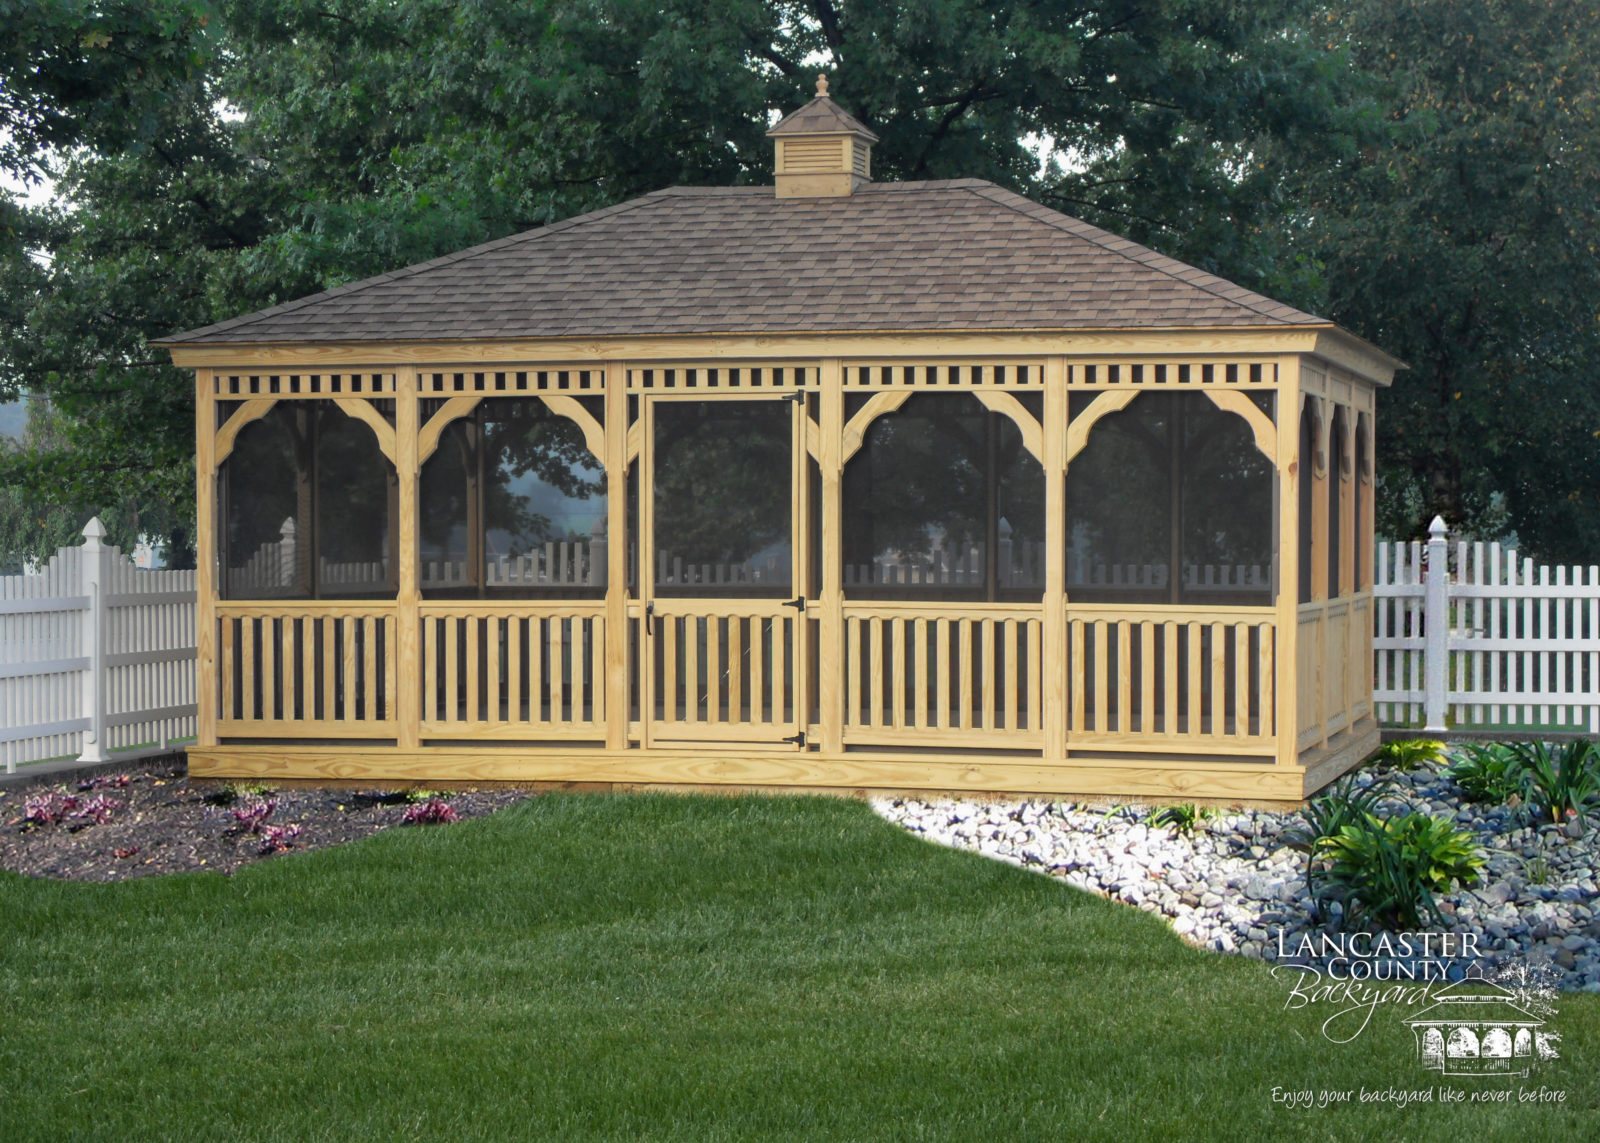 Amish built wooden rectangular gazebo